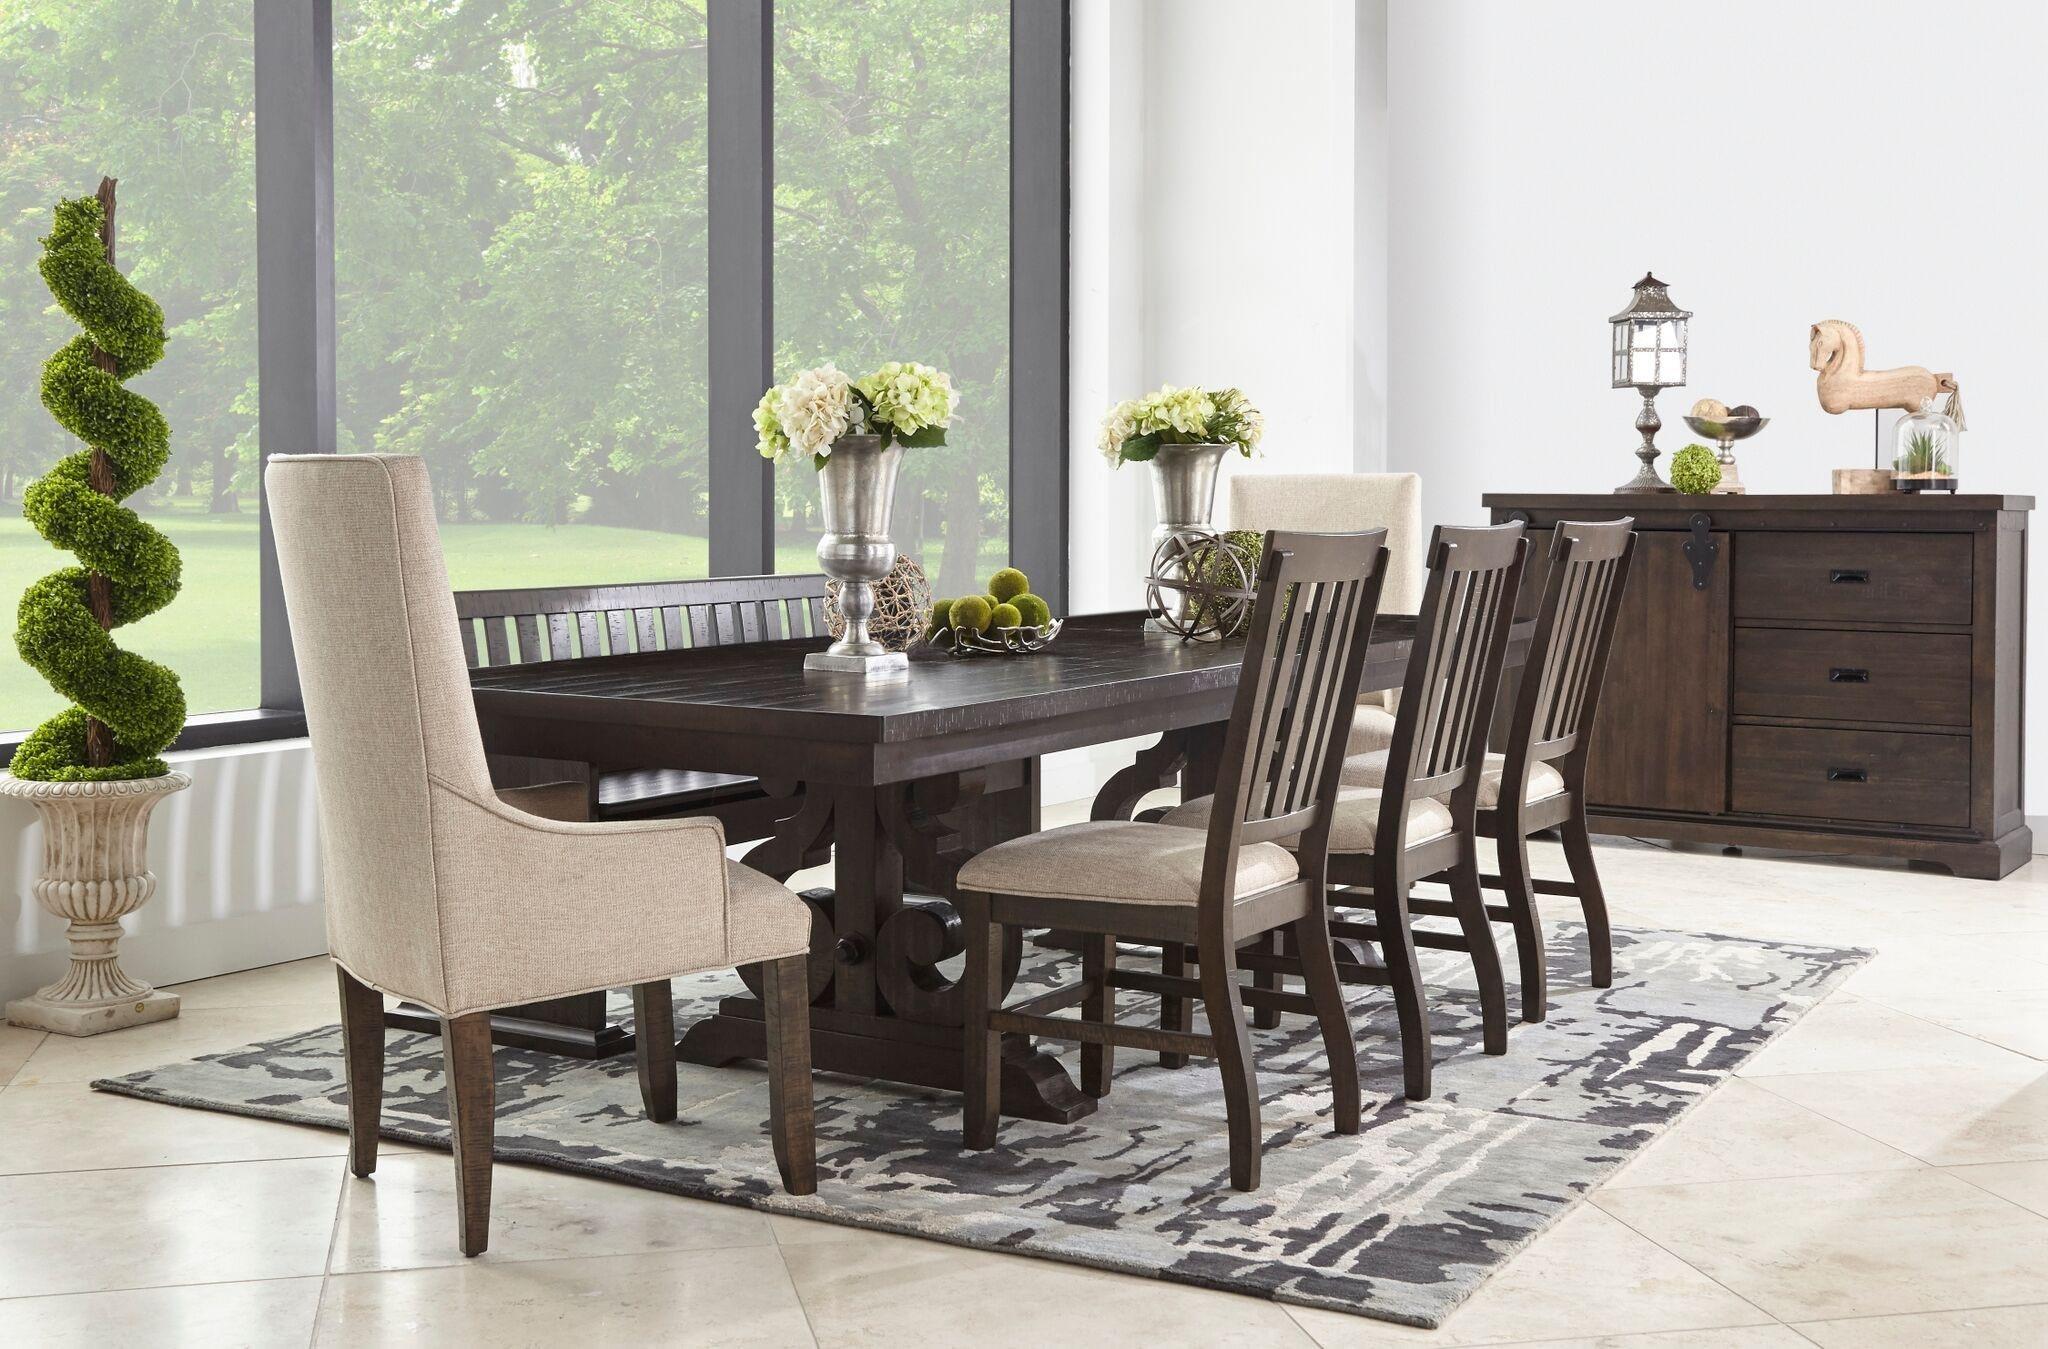 Stone 6 Piece Dining Room Set by Elements International at Sam Levitz Furniture